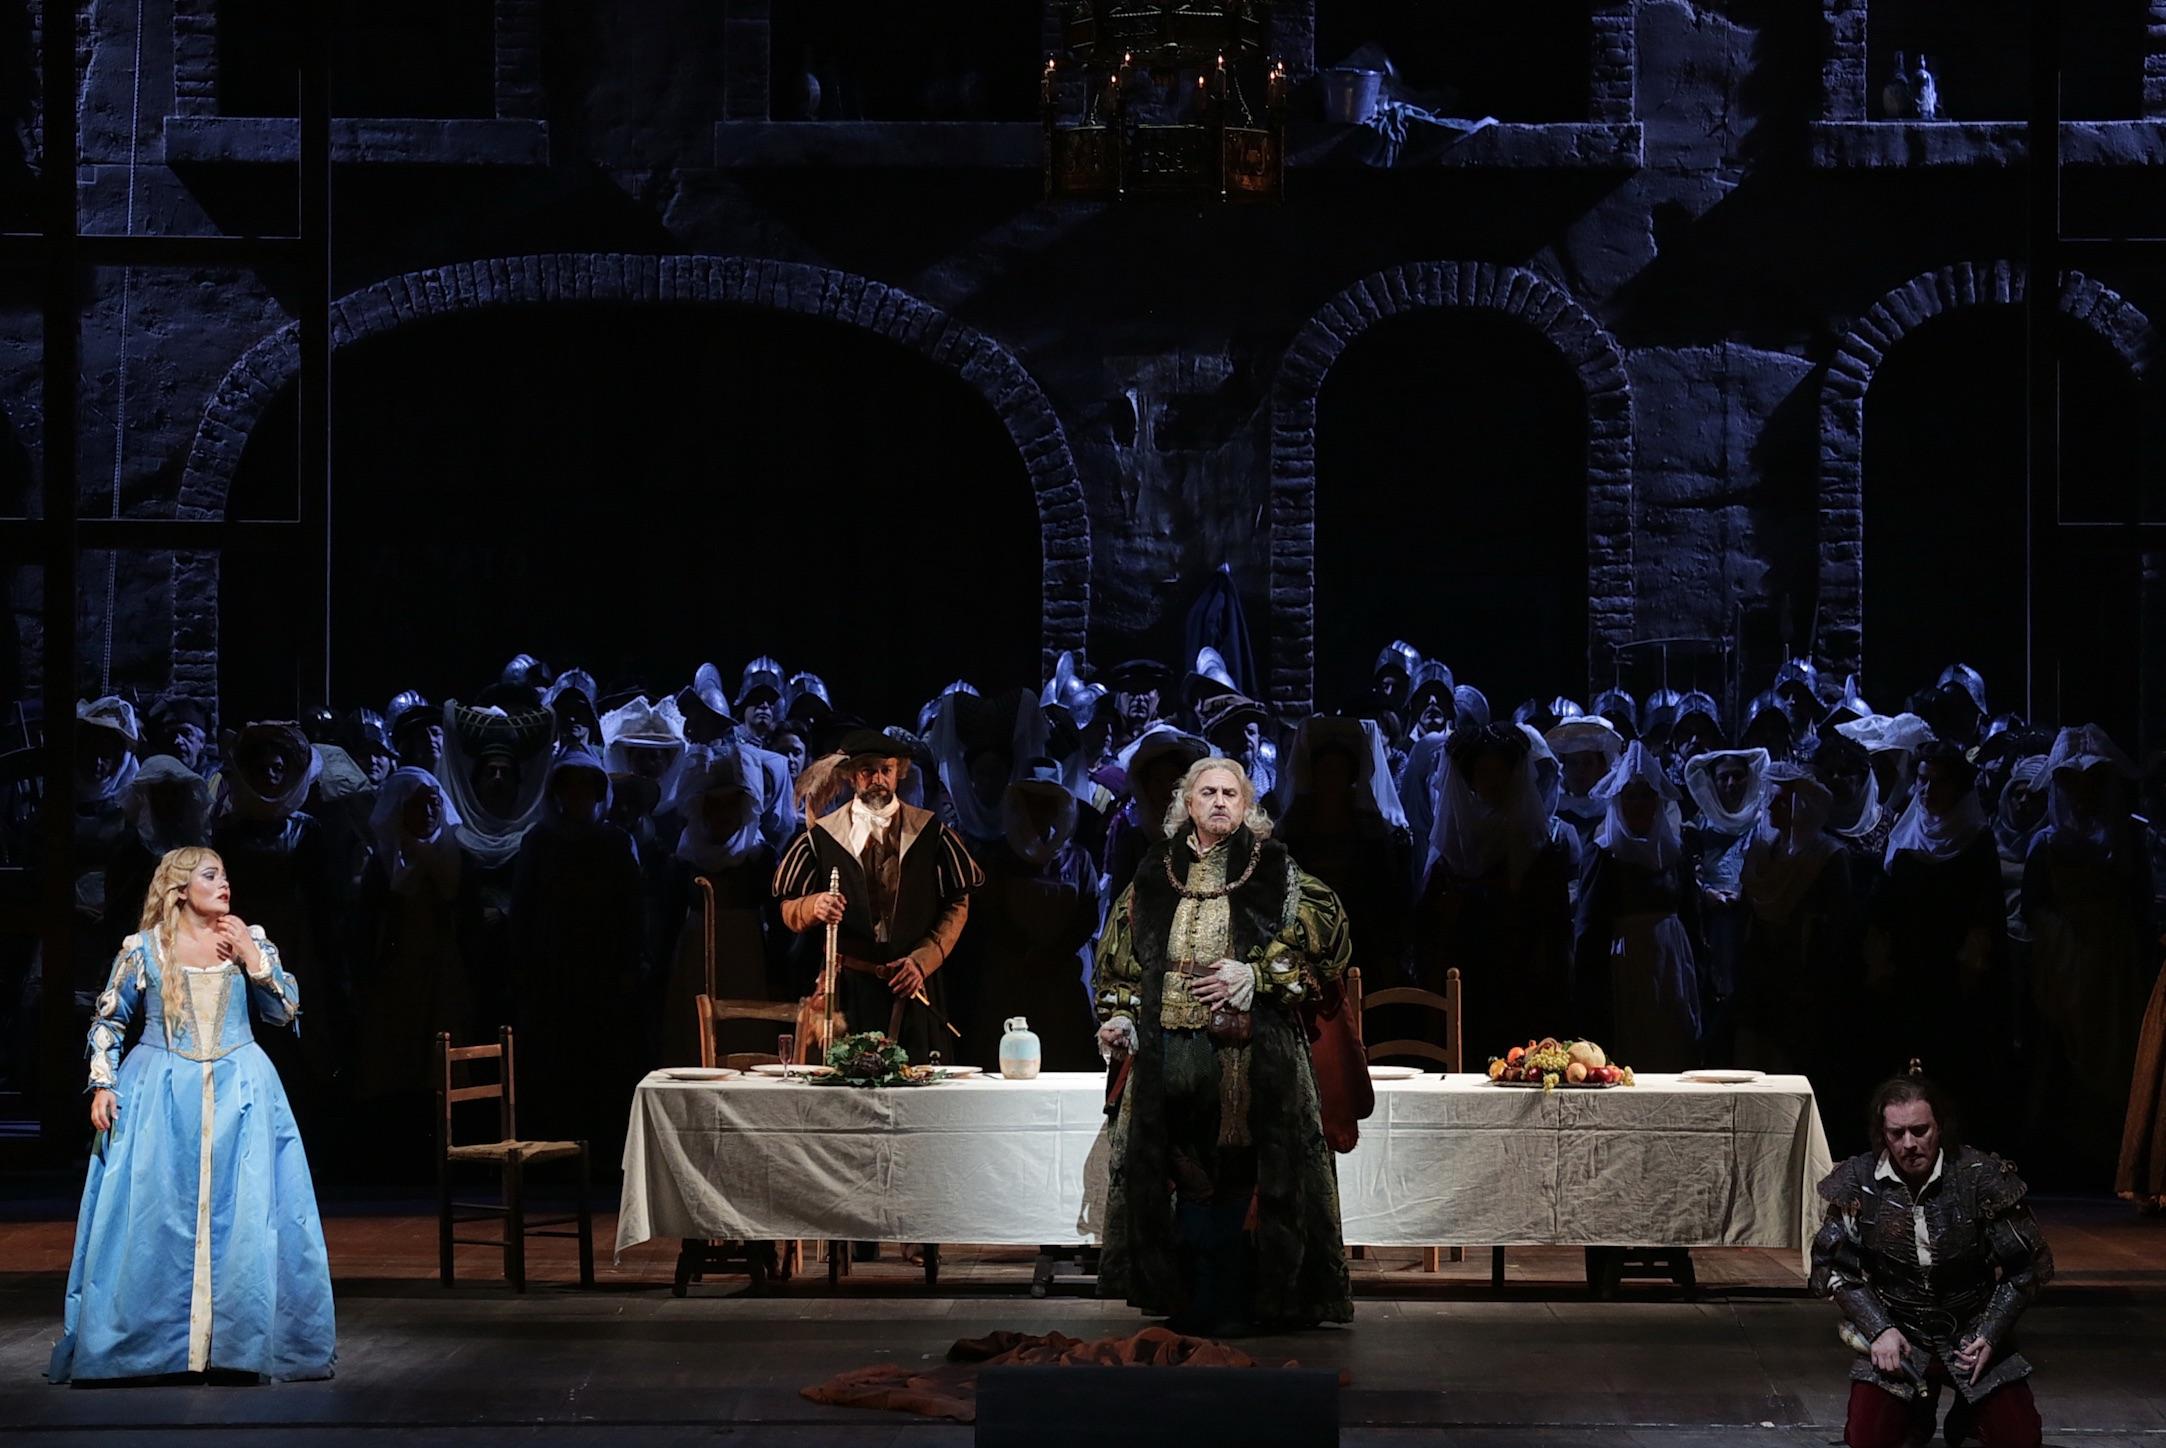 Ernani Scala, Ernani, Teatro alla Scala, Milano, Verdi, Giuseppe Verdi,